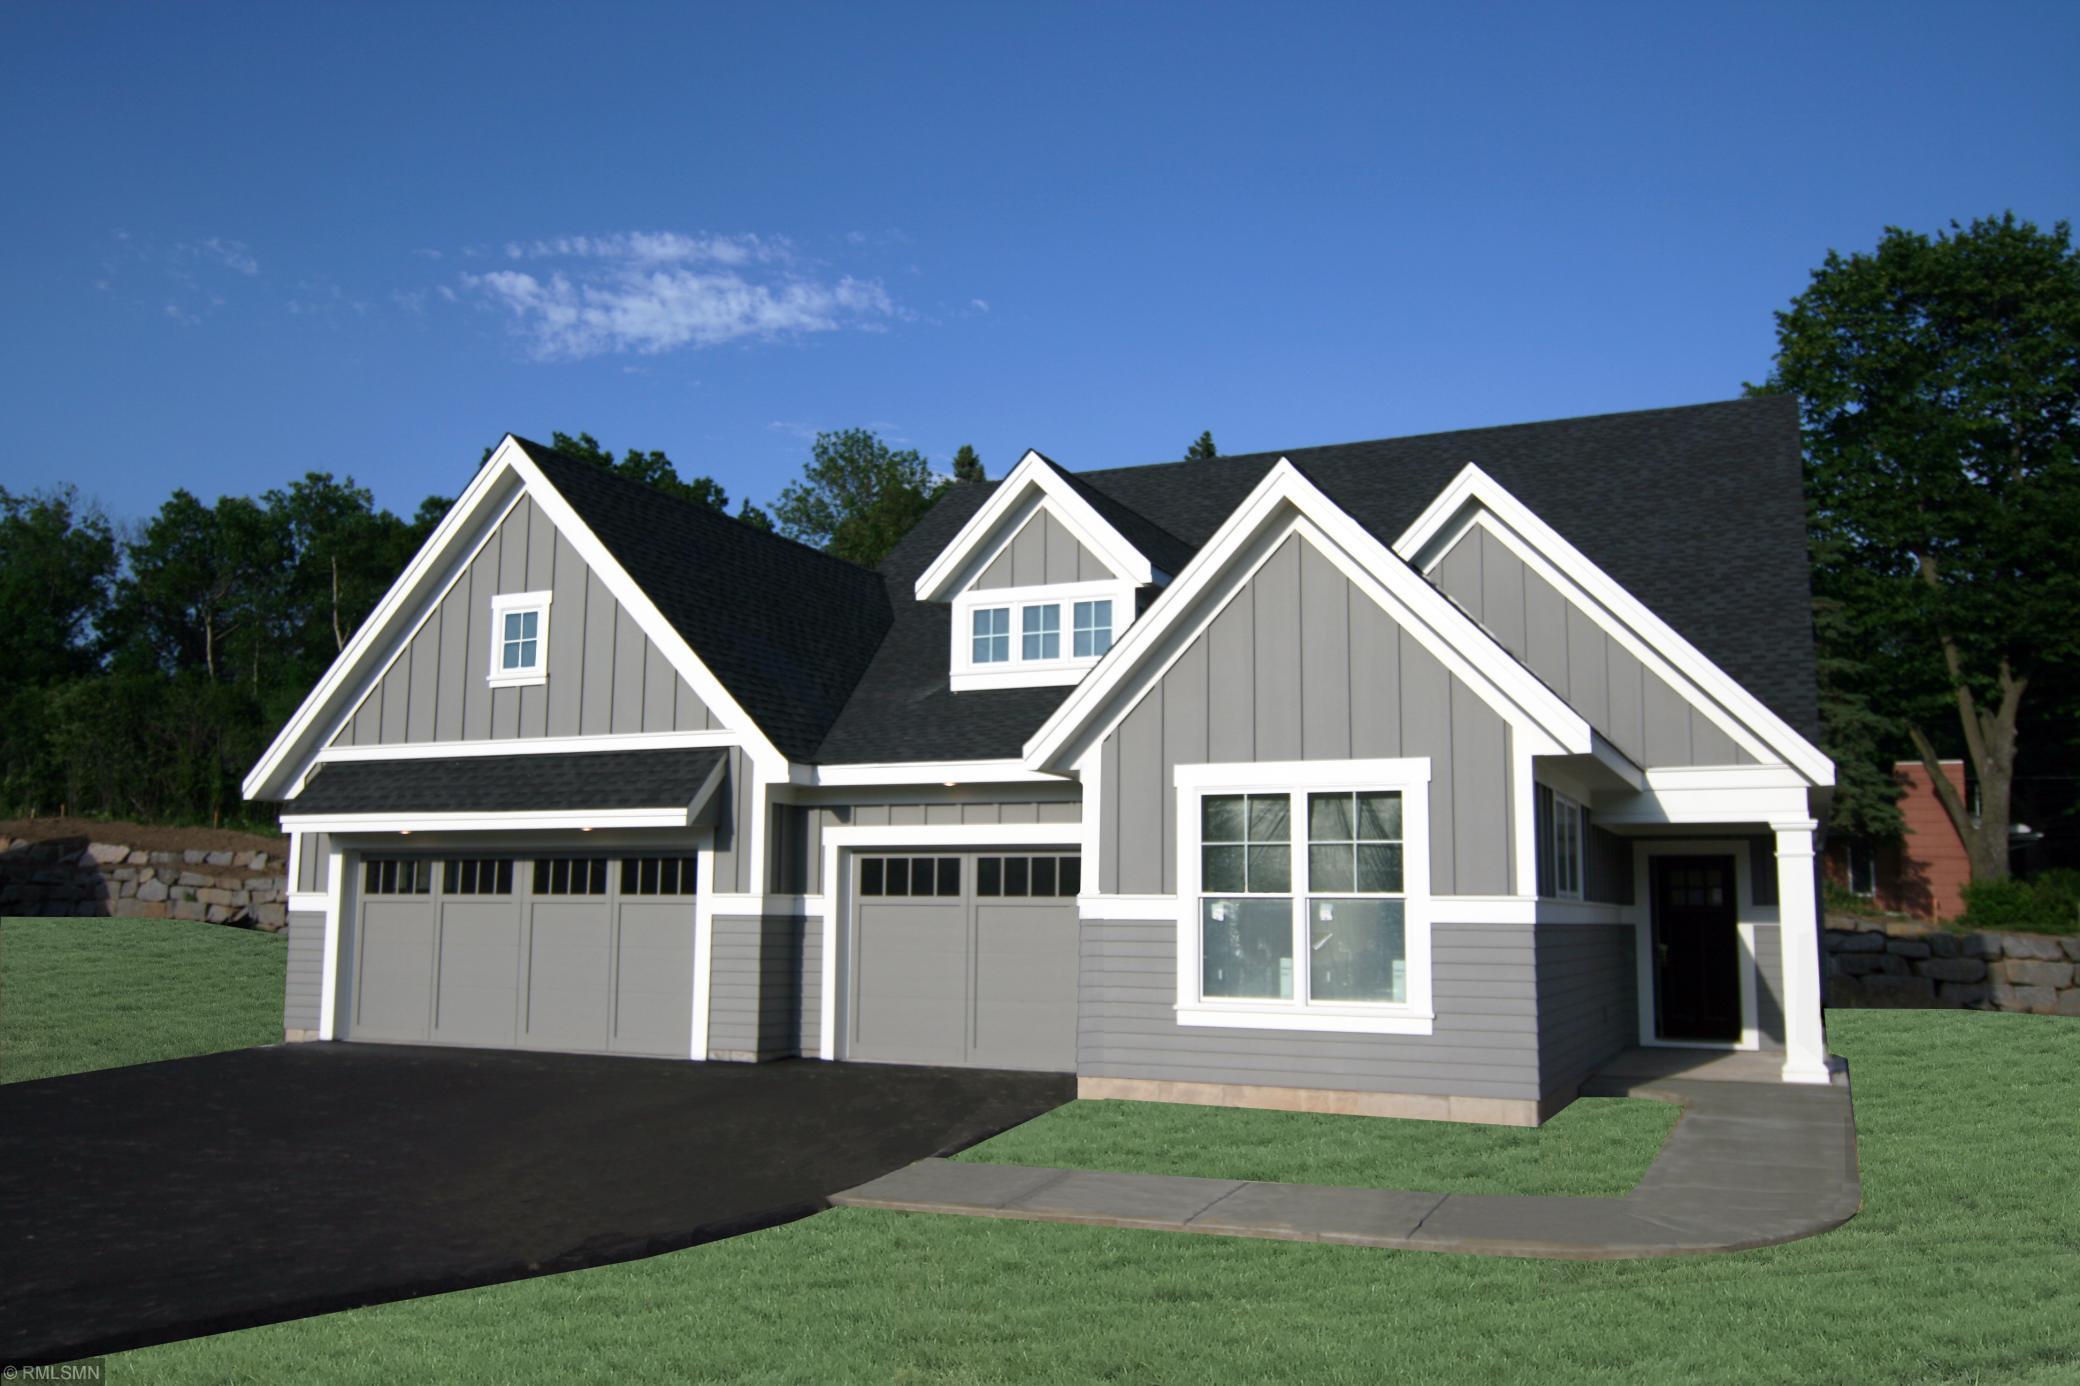 3721 Highcroft, Minnetonka, MN 55345 - Minnetonka, MN real estate listing